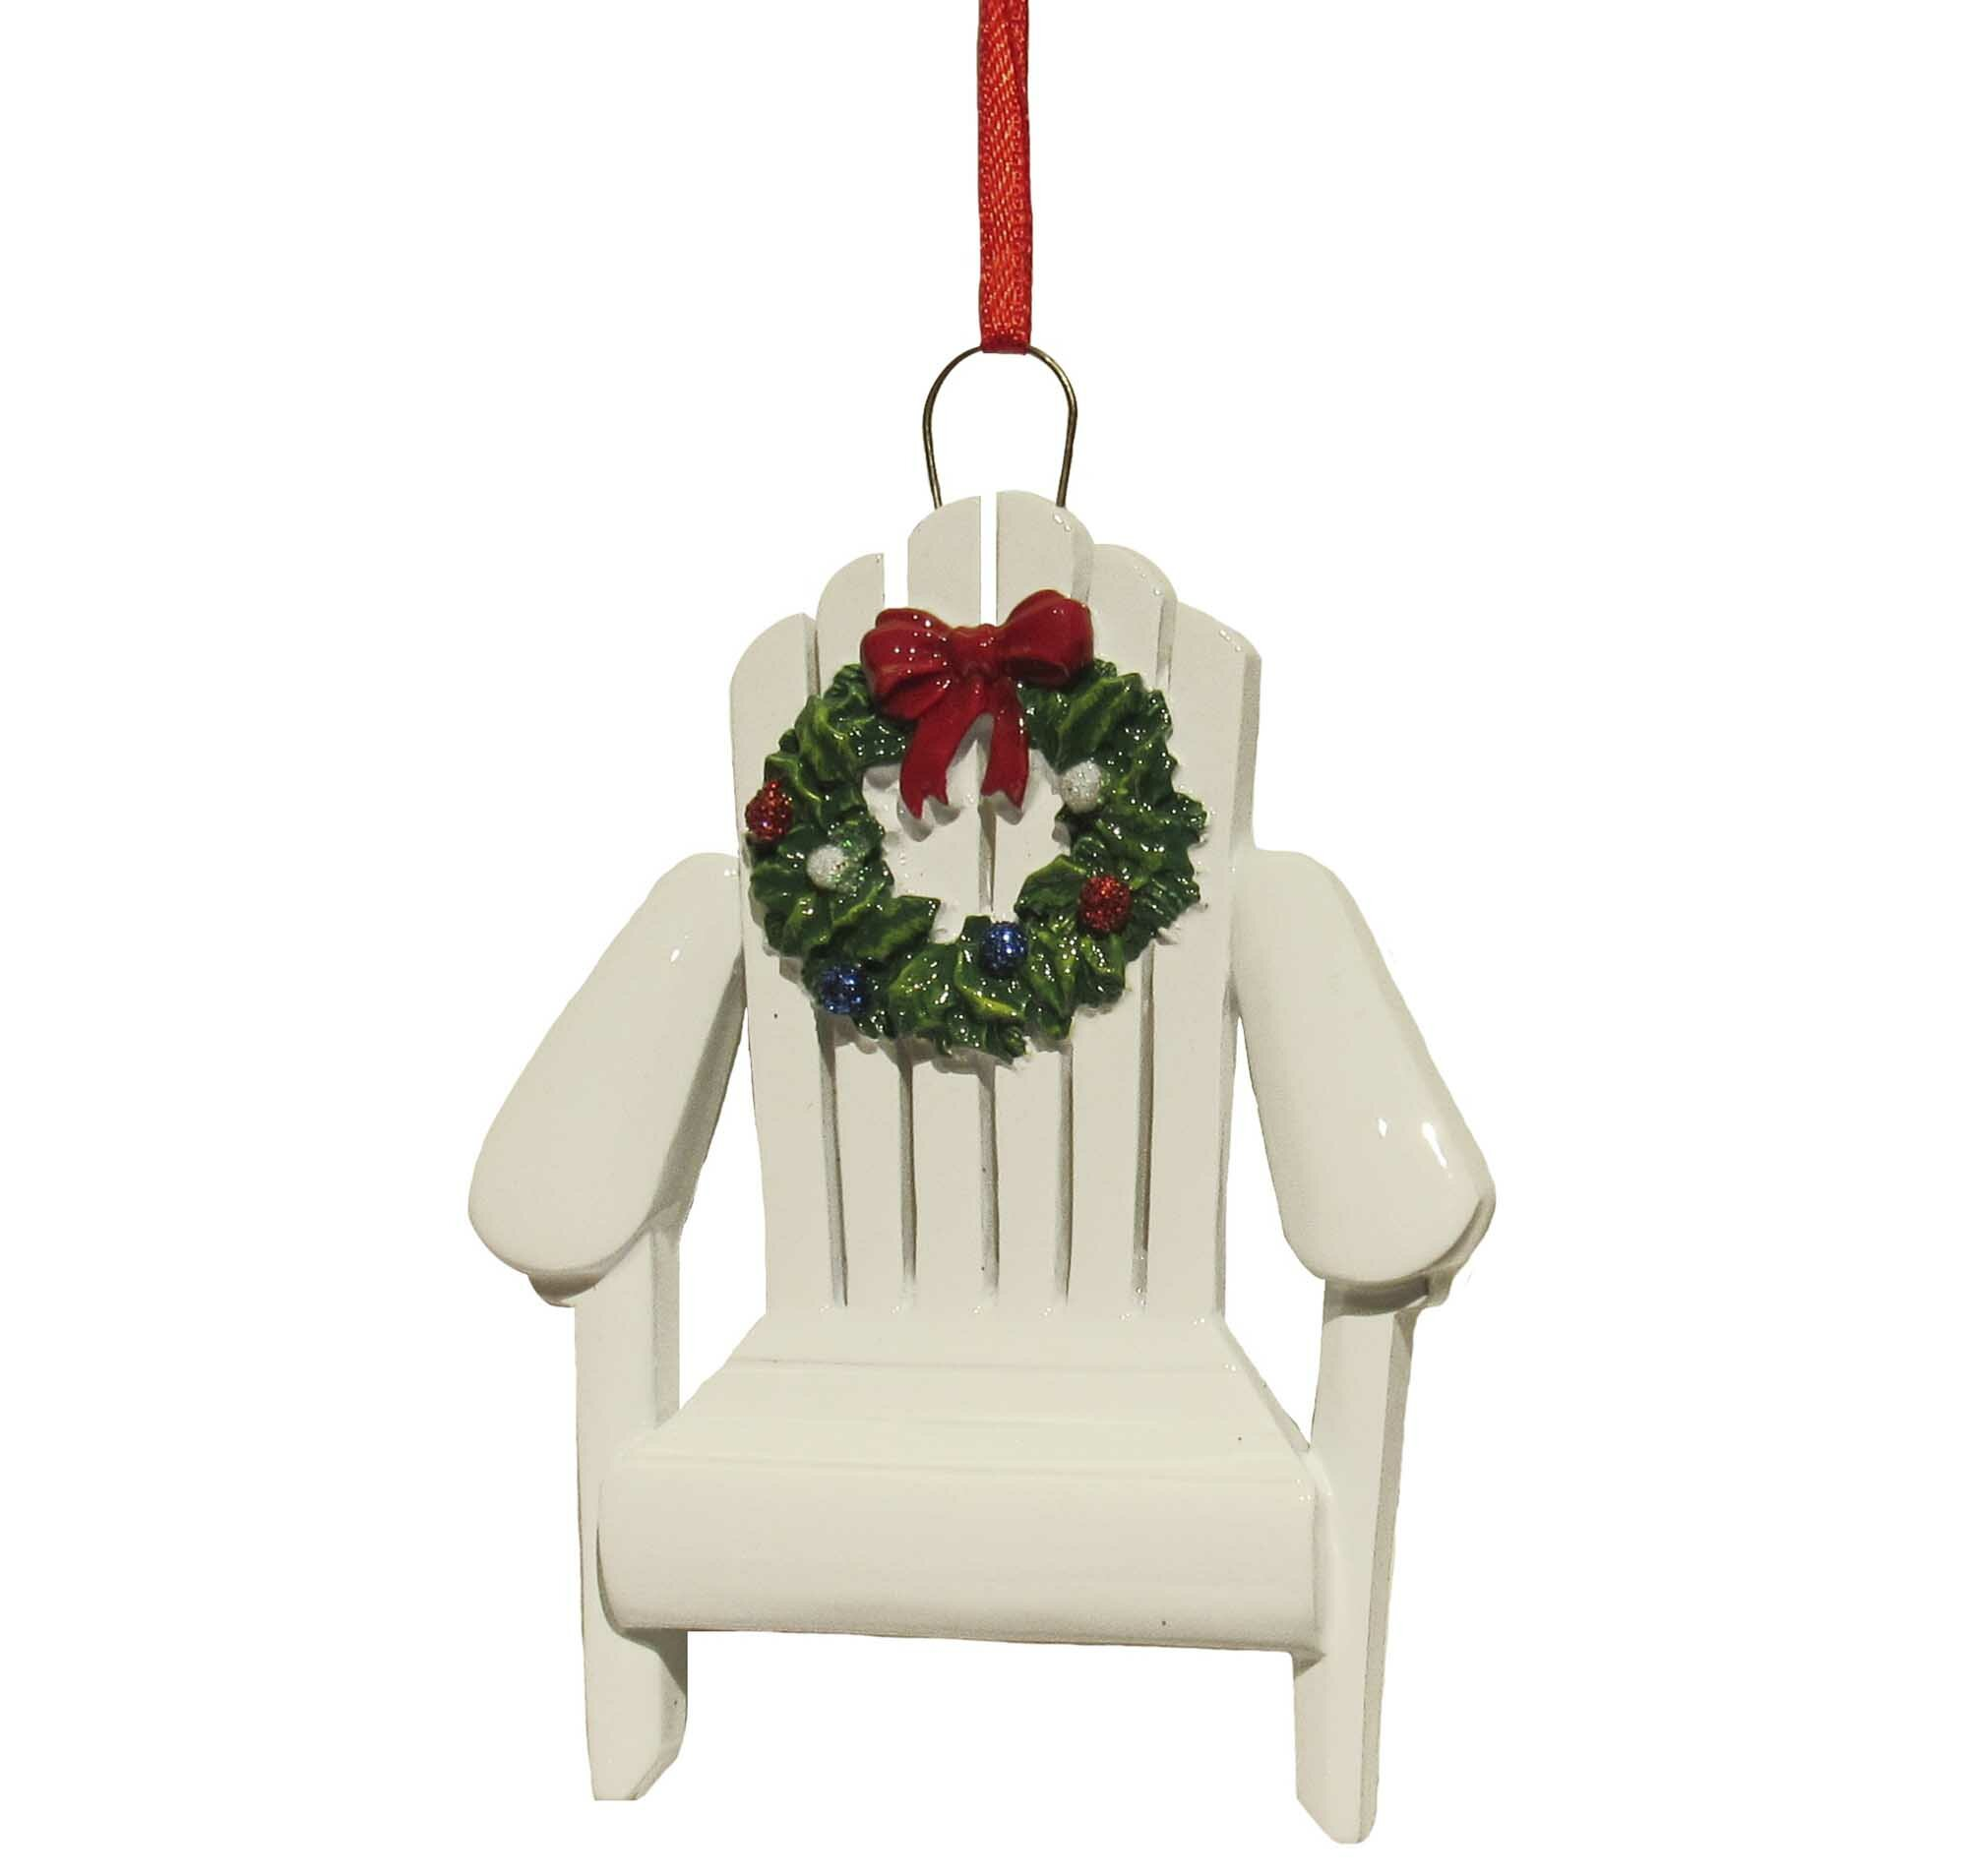 Kurt Adler Resin Adirondack Chair Ornament & Reviews | Wayfair